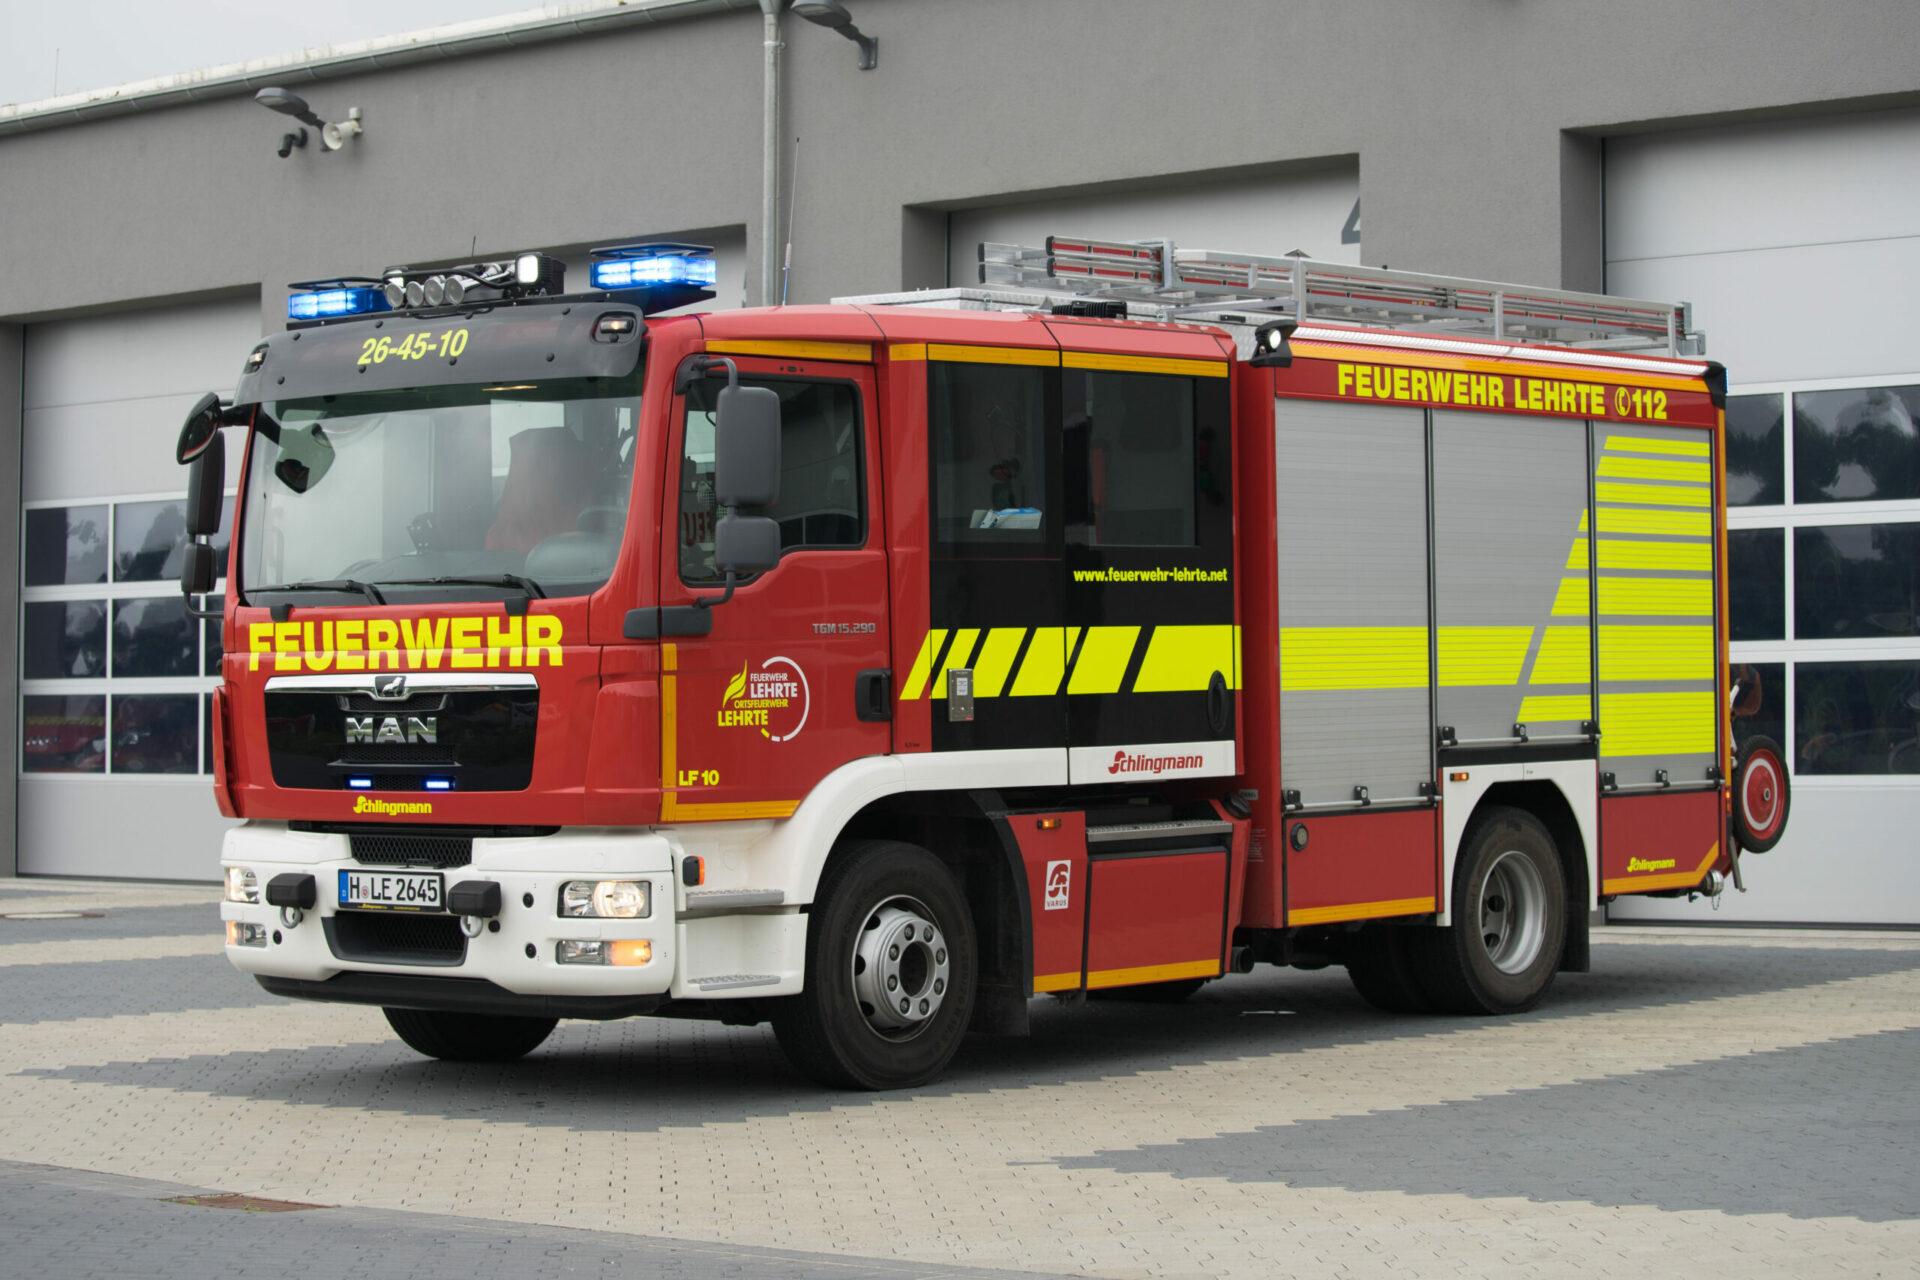 Florian Hannover-Land 26-45-10